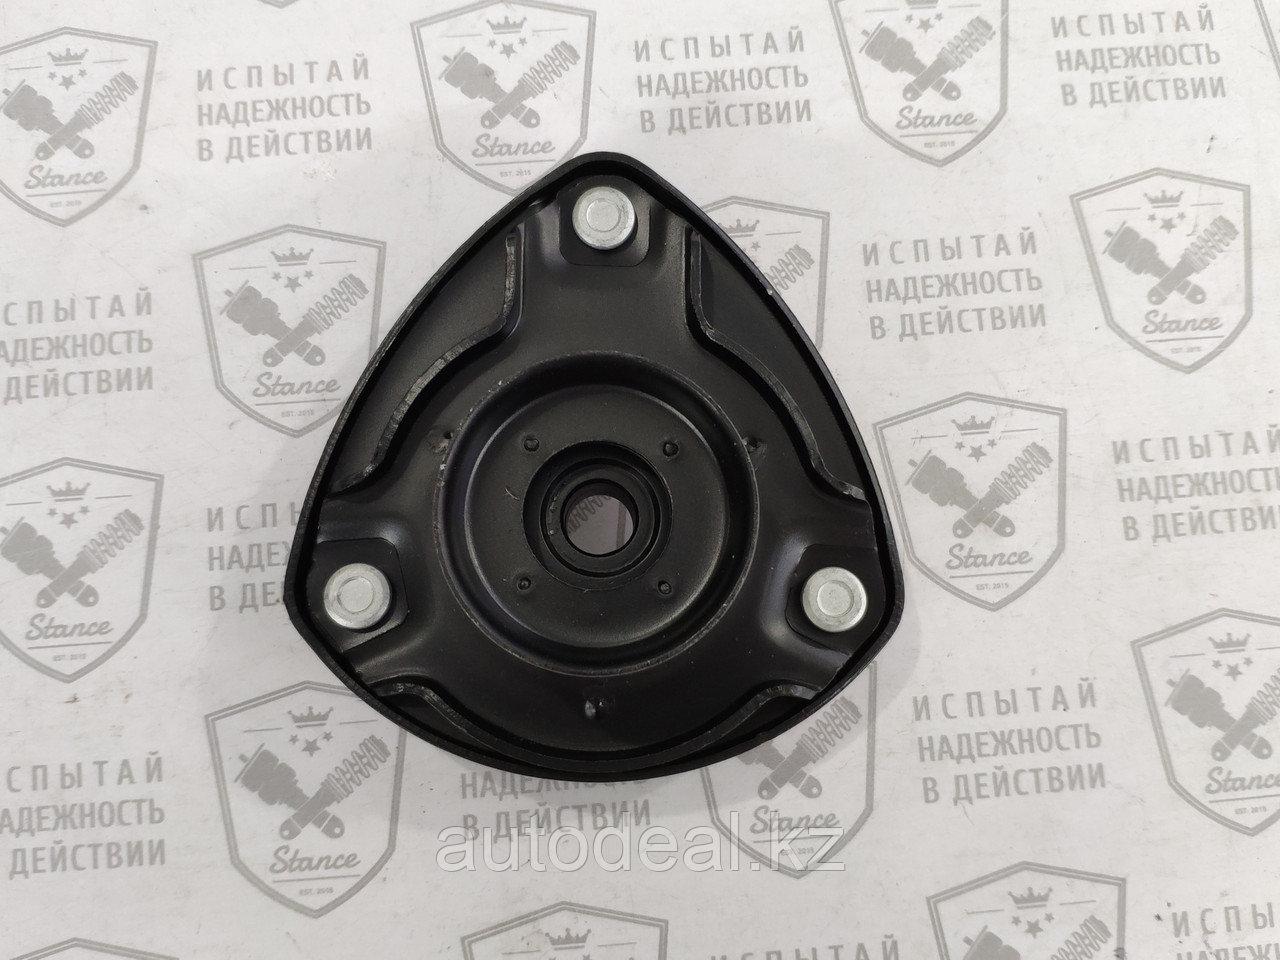 Опора переднего амортизатора JAC S3 / Front shock absorber support